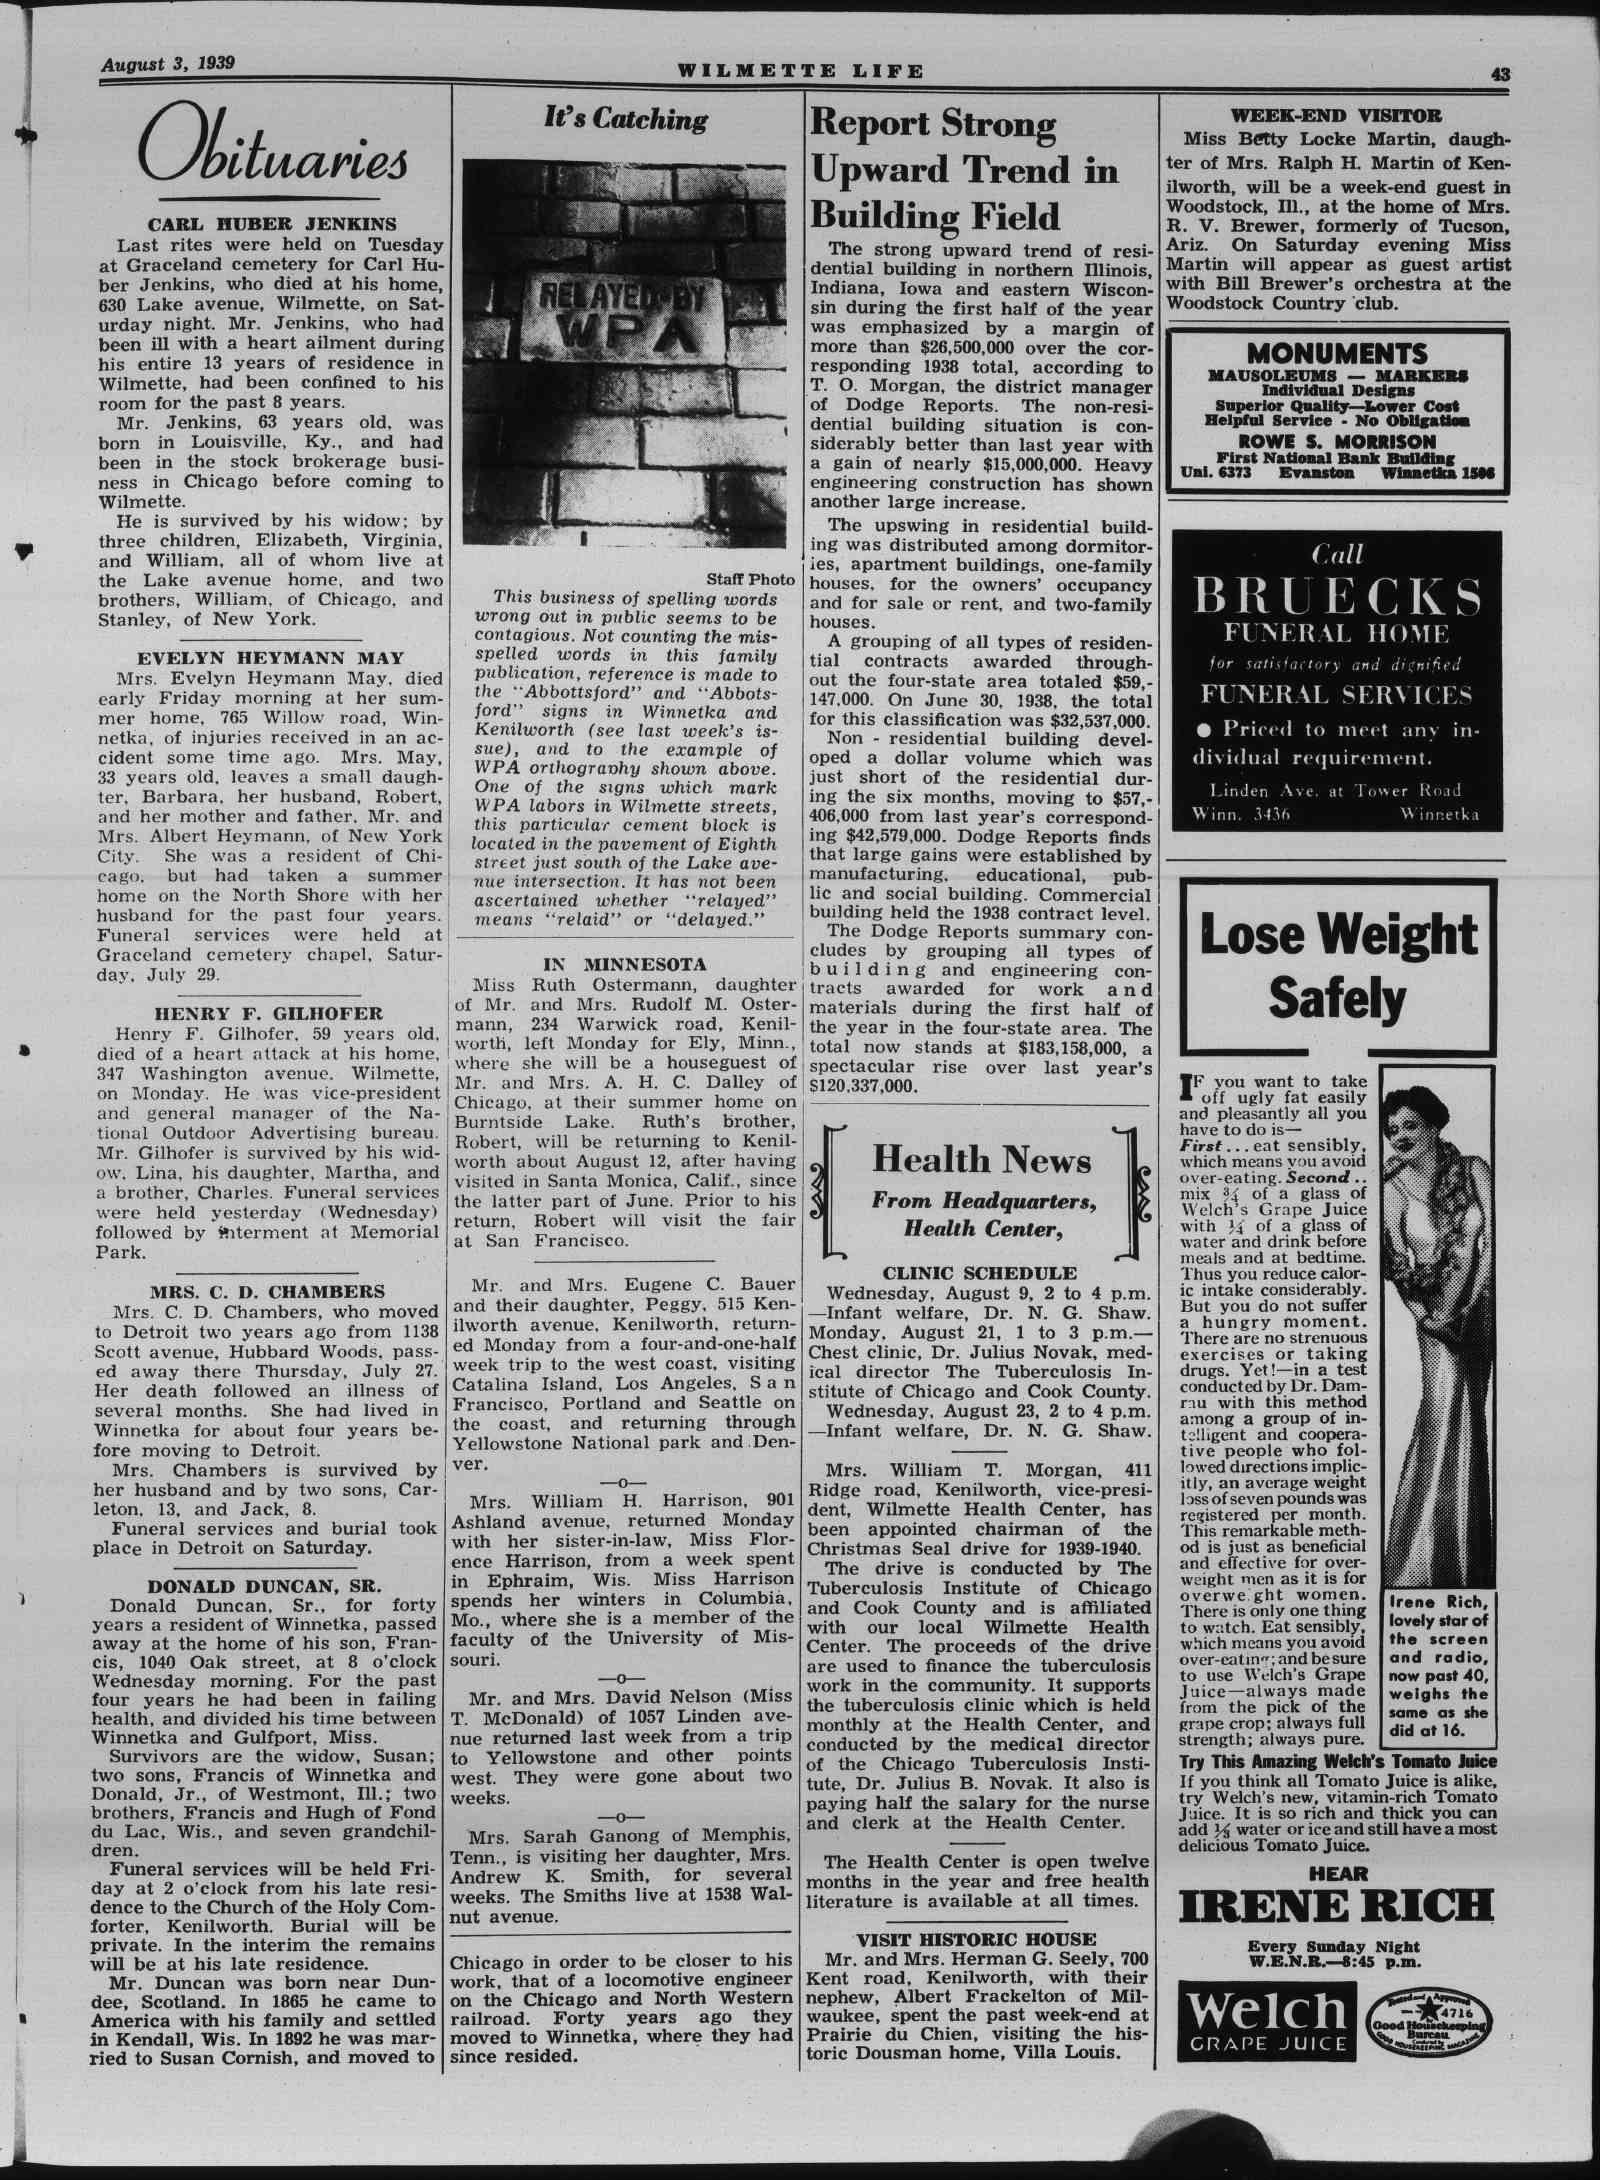 Wilmette Life (Wilmette, Illinois), 3 Aug 1939